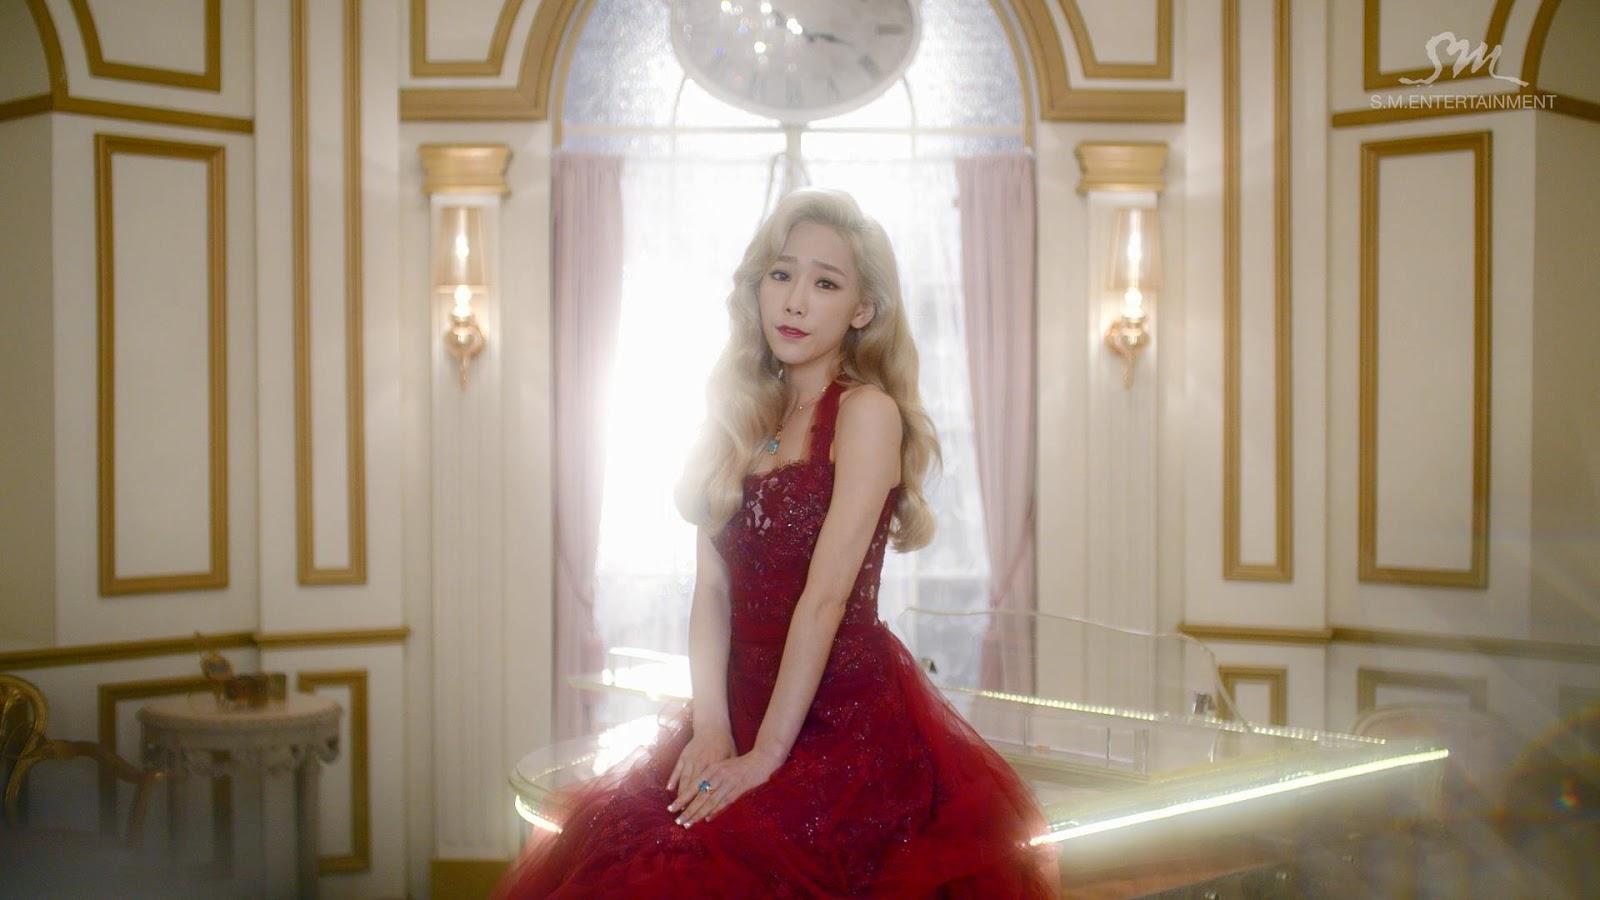 Red Dress Girl Wallpaper Girl S Generation Tts Dear Santa Screen Caps Daily K